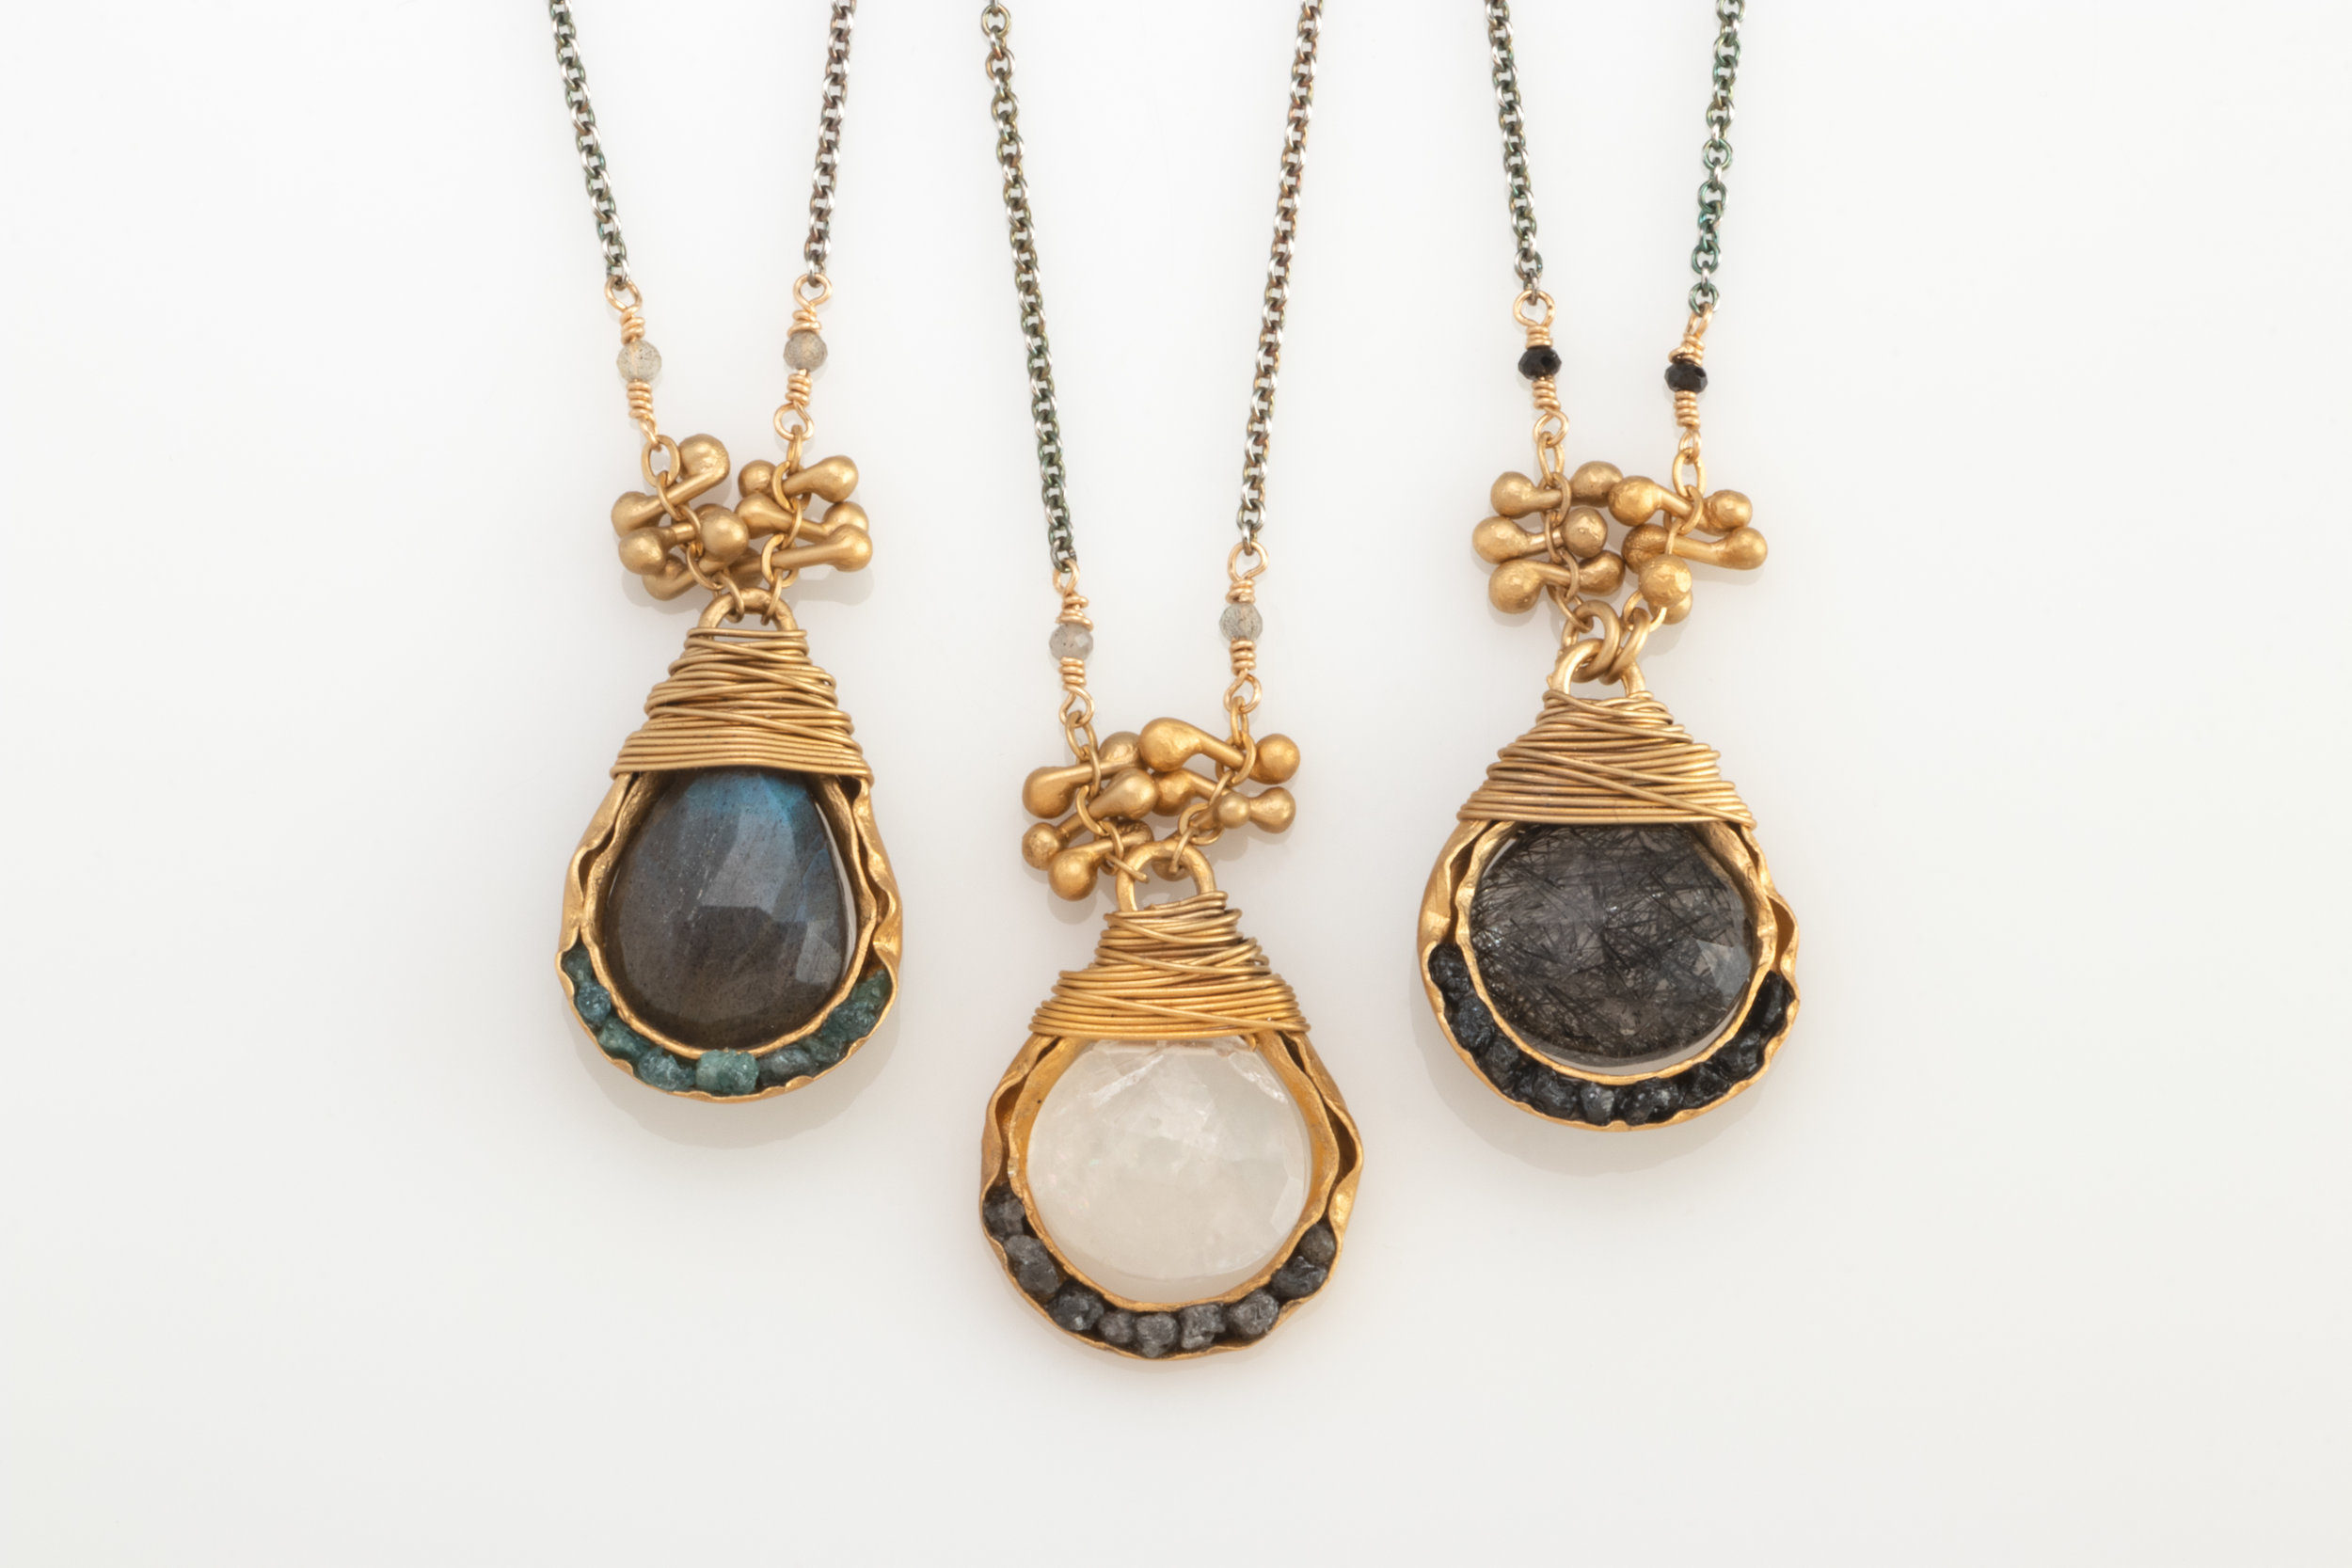 August Nine Designs - Richmond, VA.  Handmade earrings, necklaces, & bracelets using sterling silver, gold, & precious & semi-precious stones.